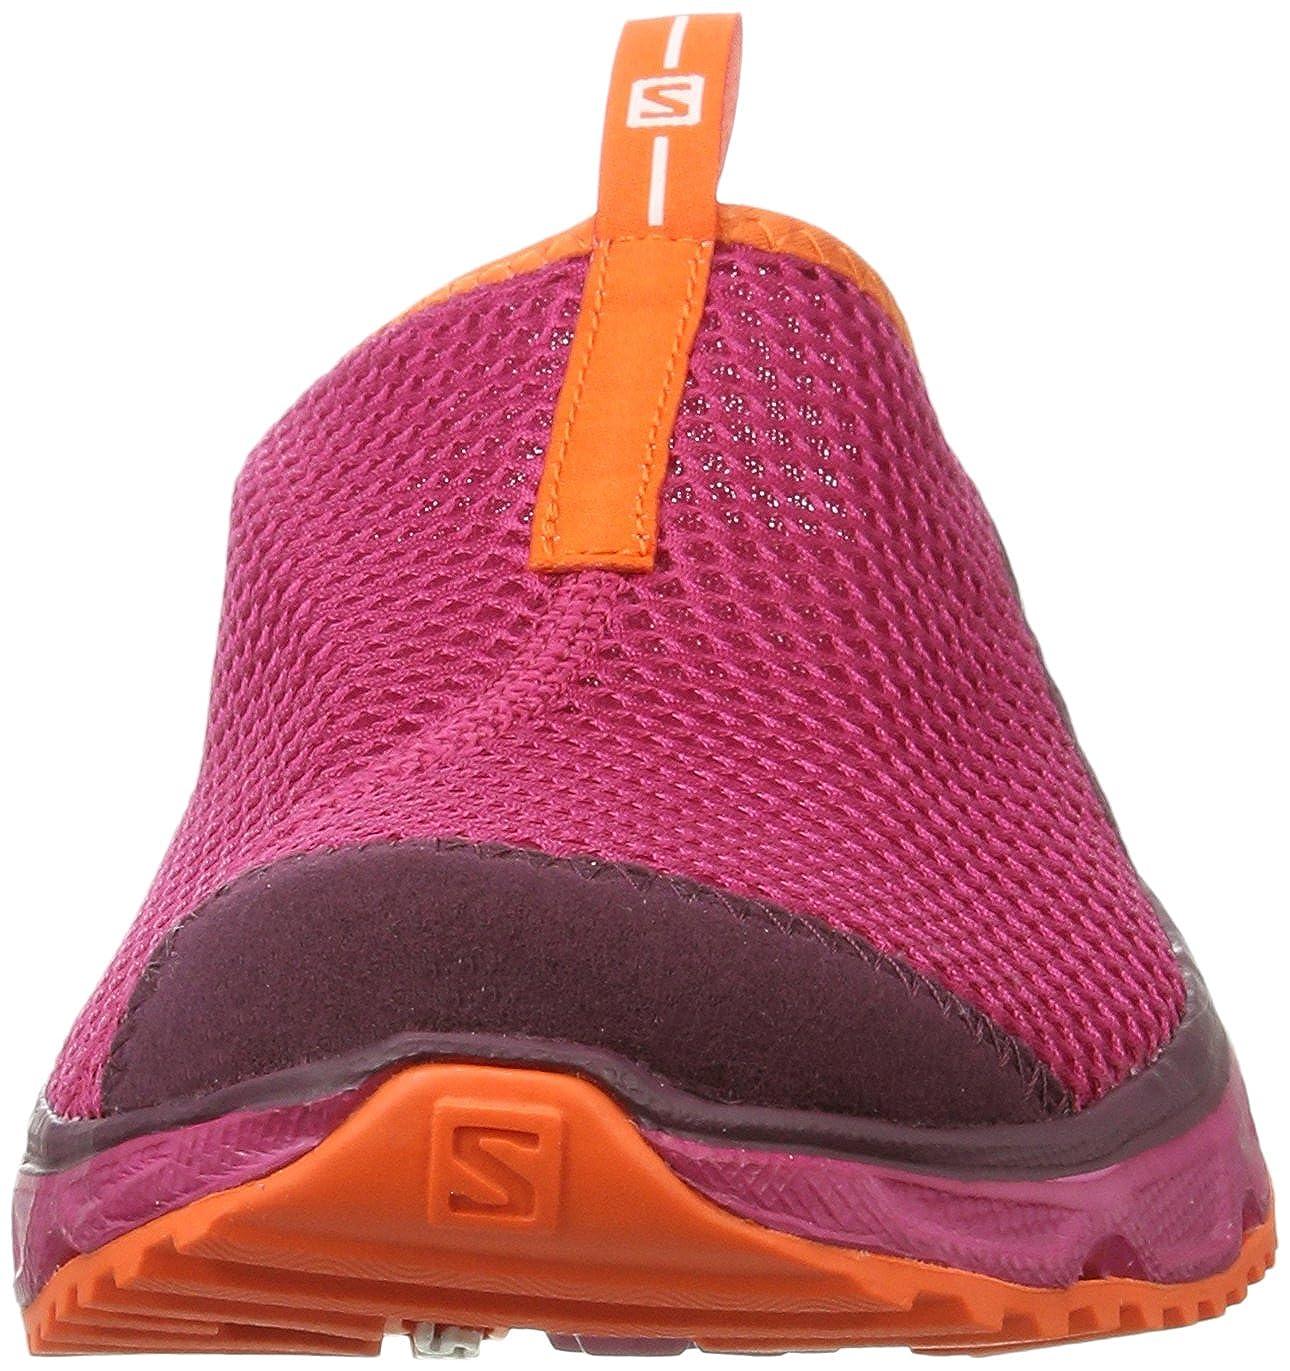 Salomon Damen Rx Slide Traillaufschuhe, Traillaufschuhe, Traillaufschuhe, 2f242e